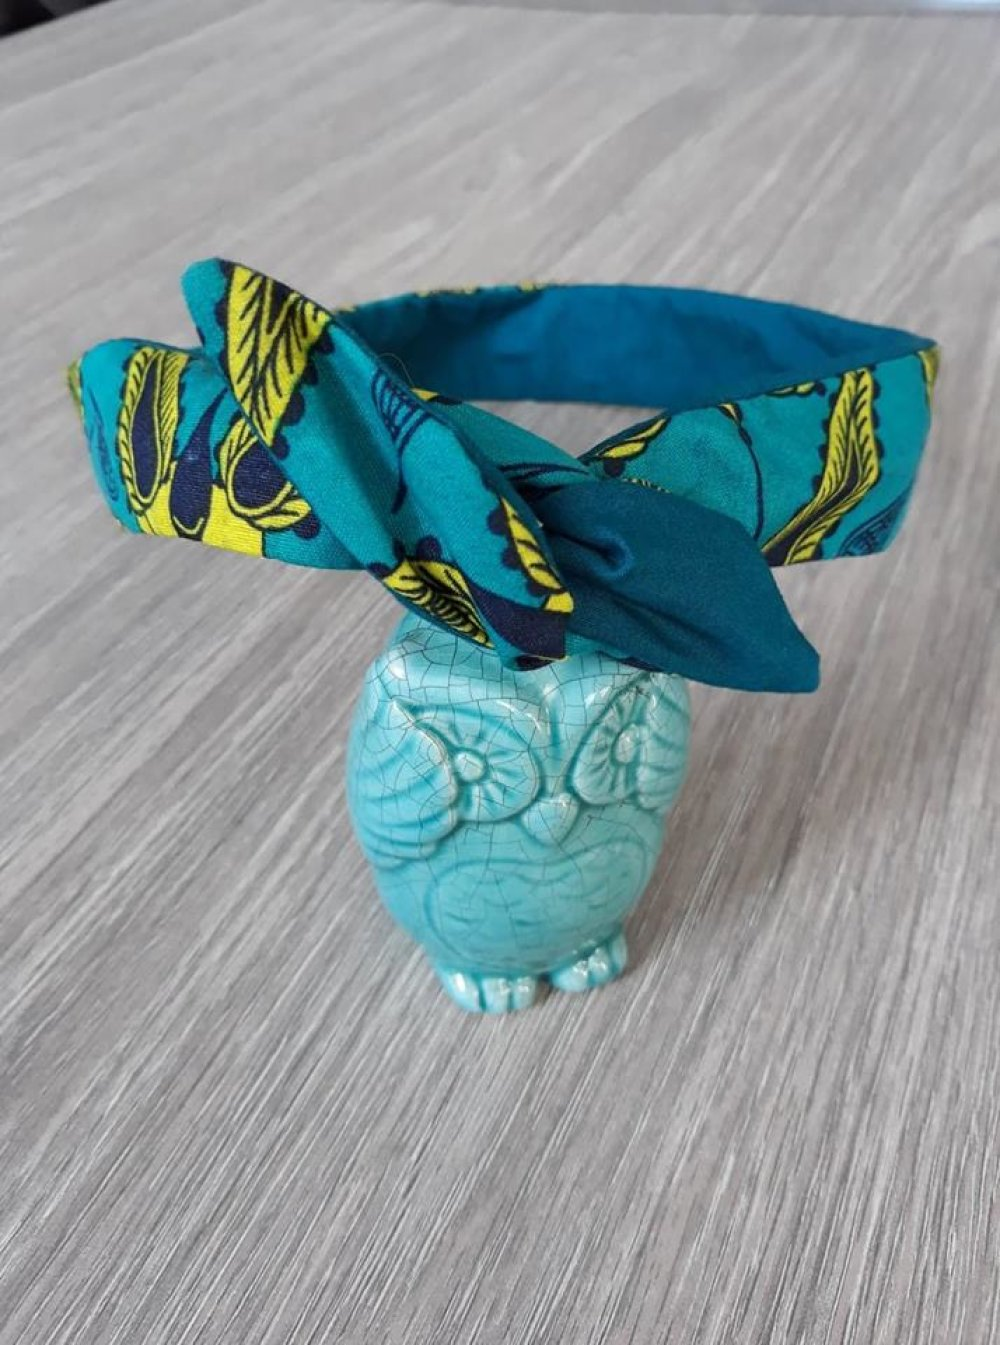 Bandeau headband rigide en tissu wax et tissu uni turquoise